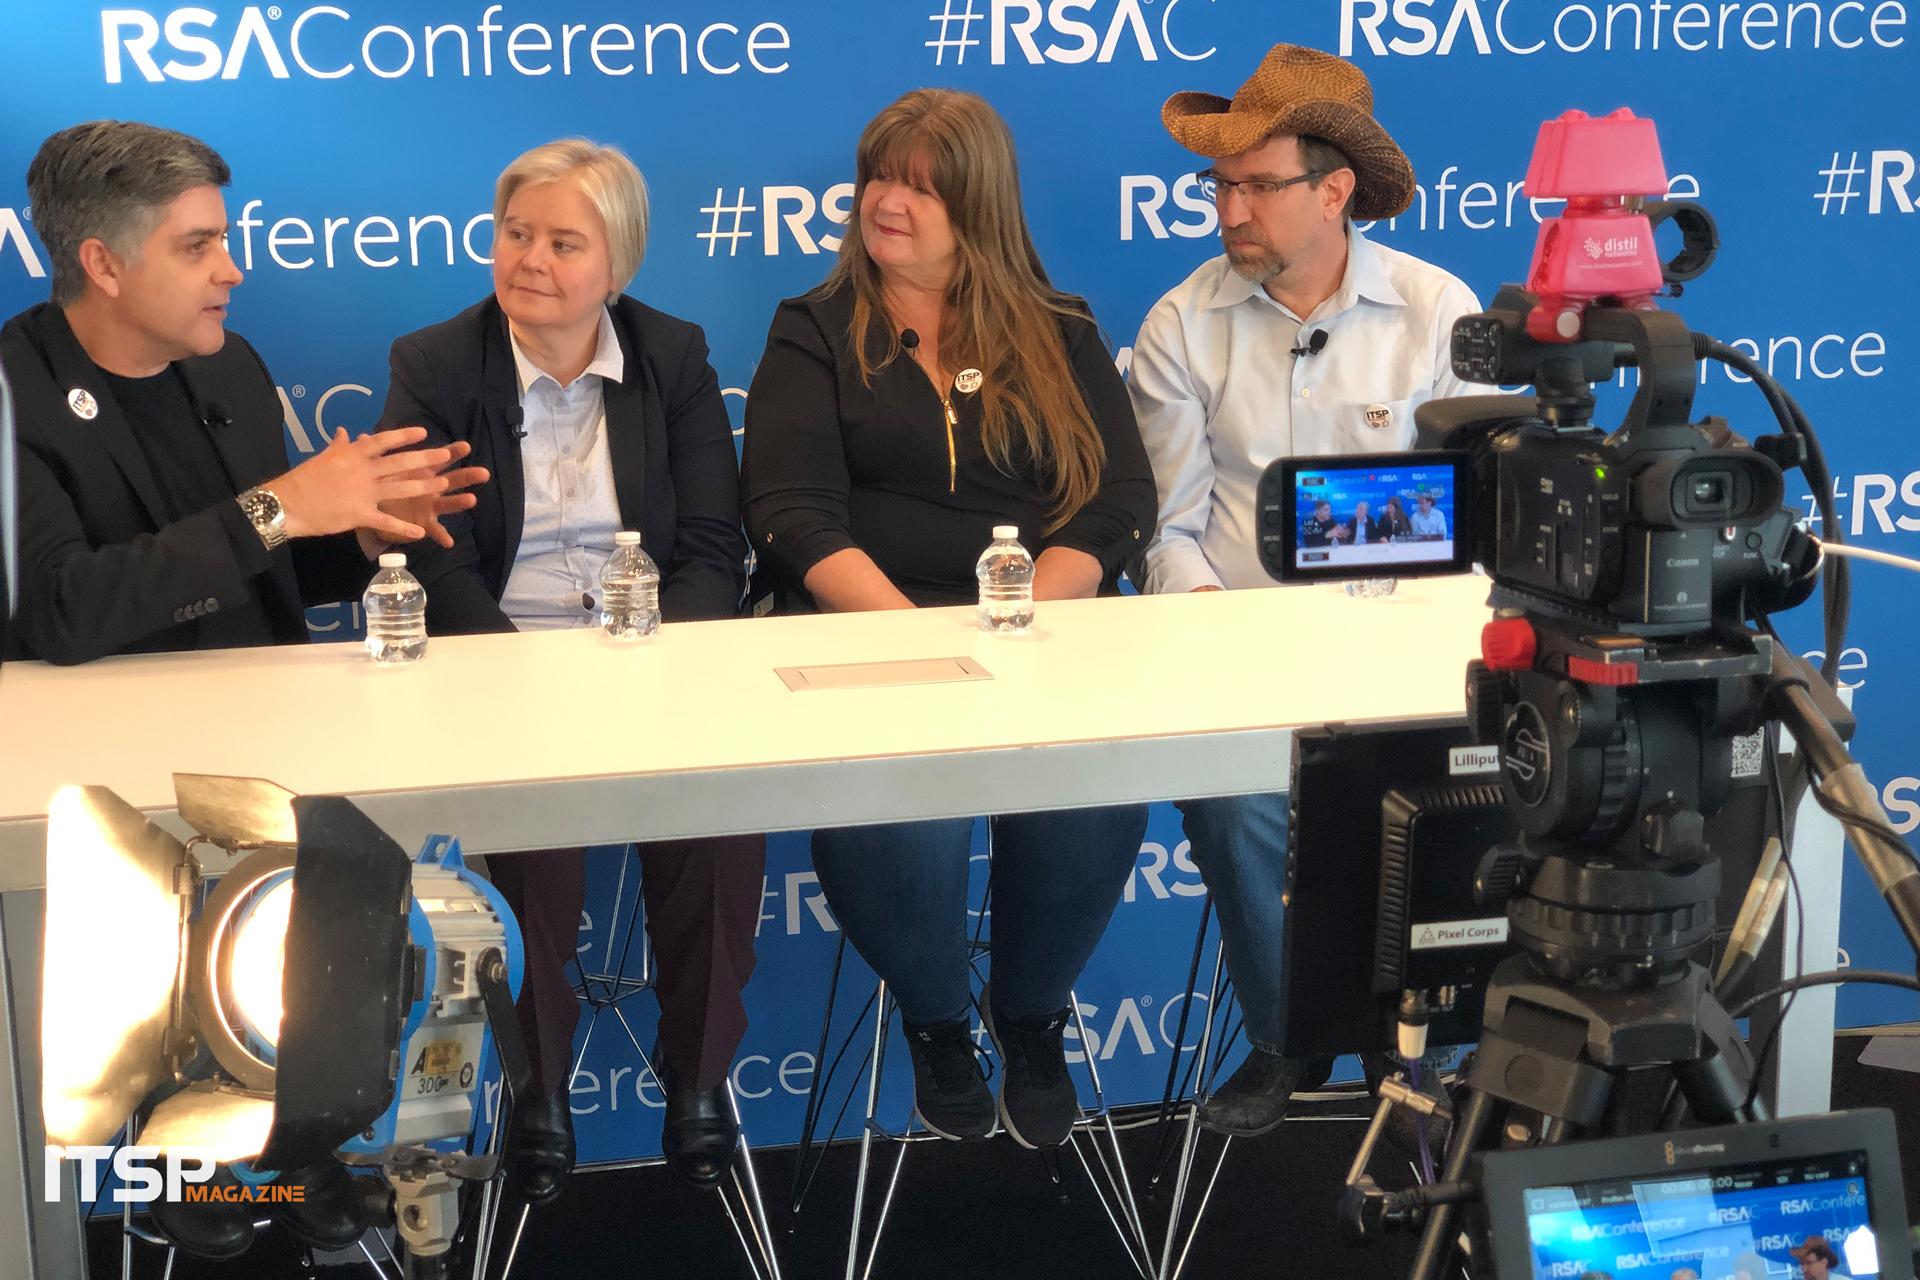 Sean Martin, Sian John (Microsoft), Candy Alexander (ISSA Int'l), Allan Alford (Mitel) (  watch the video  )